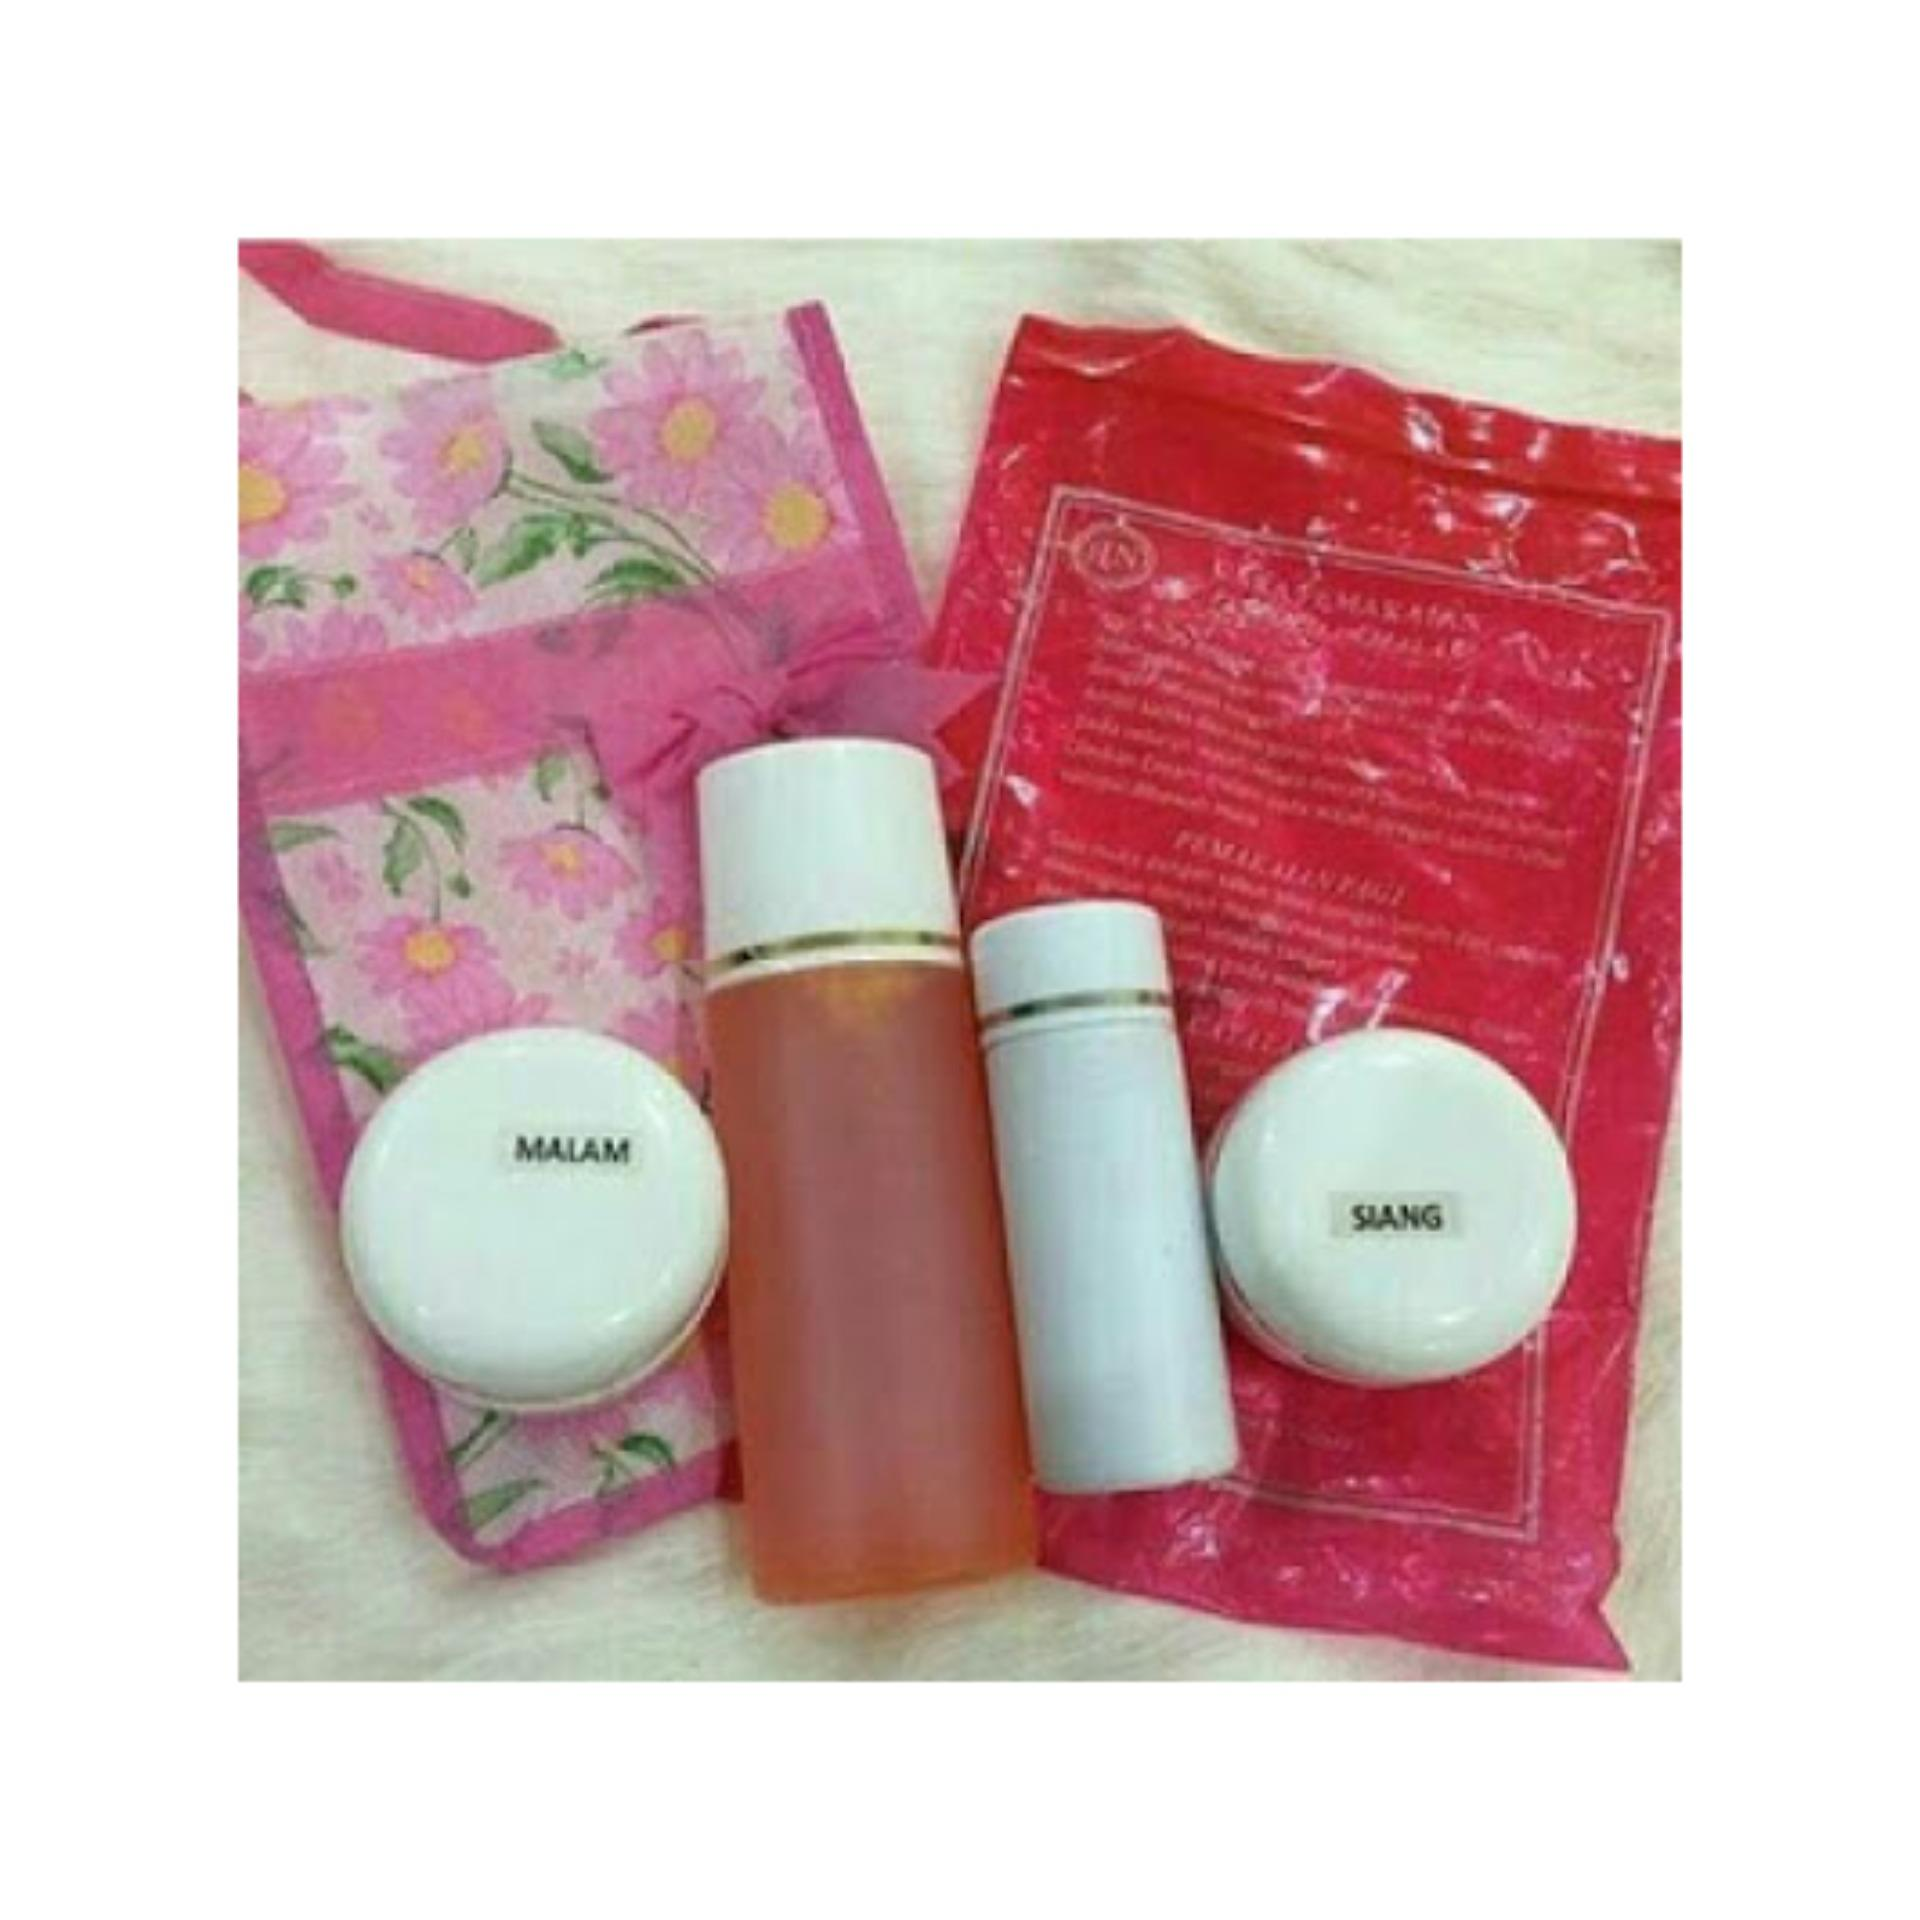 Beli Best Seller Paket Hn 30 Gr Cream Sabun Toner Universal Murah